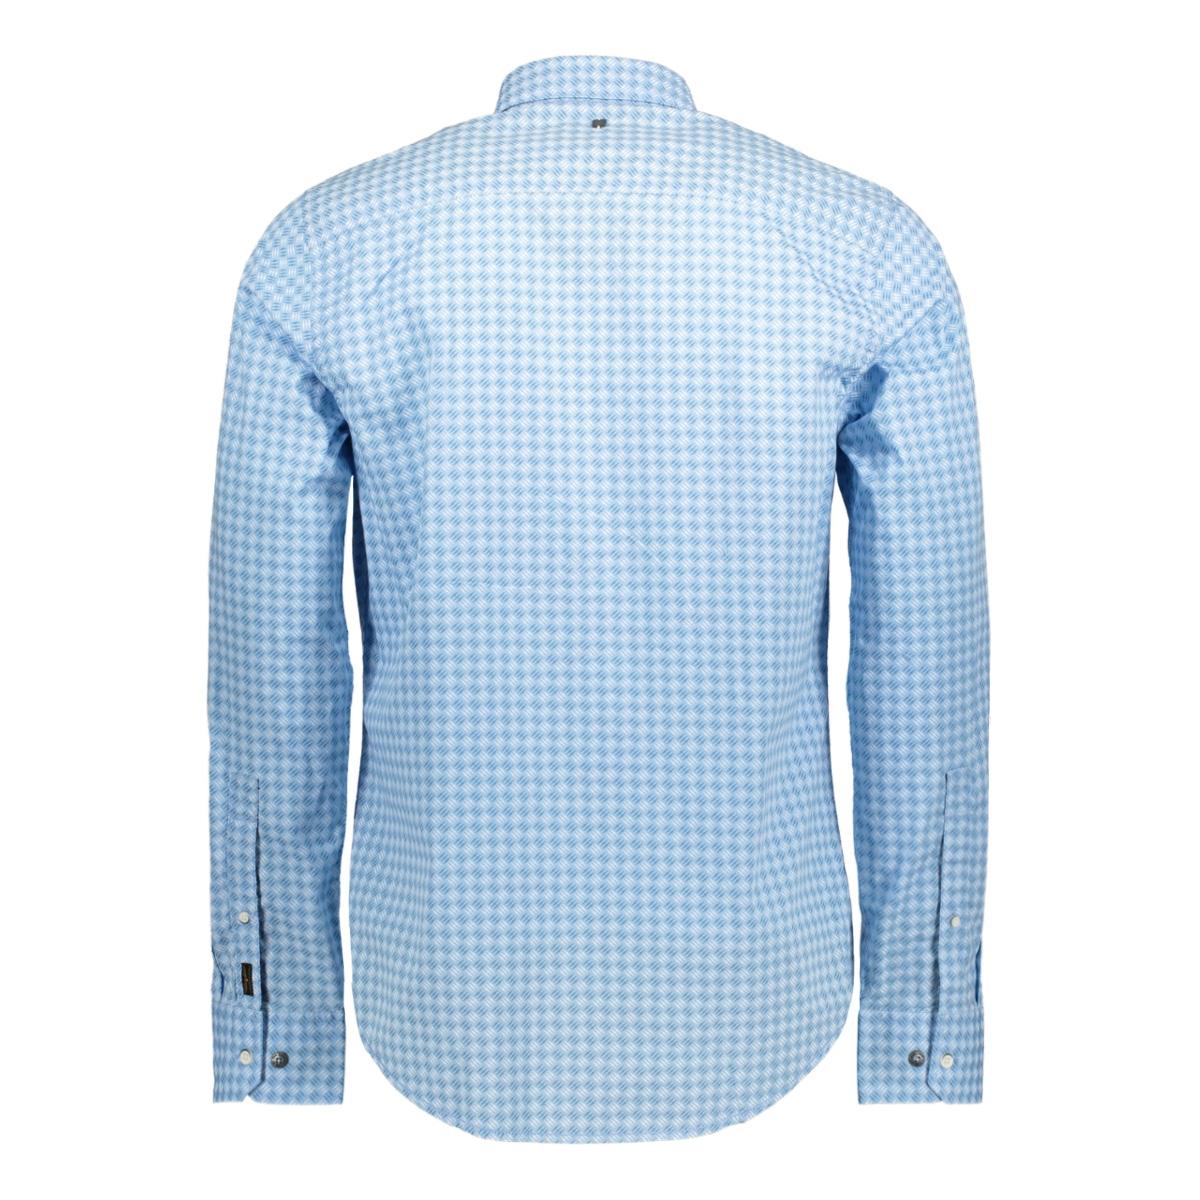 psi175208 pme legend overhemd 547